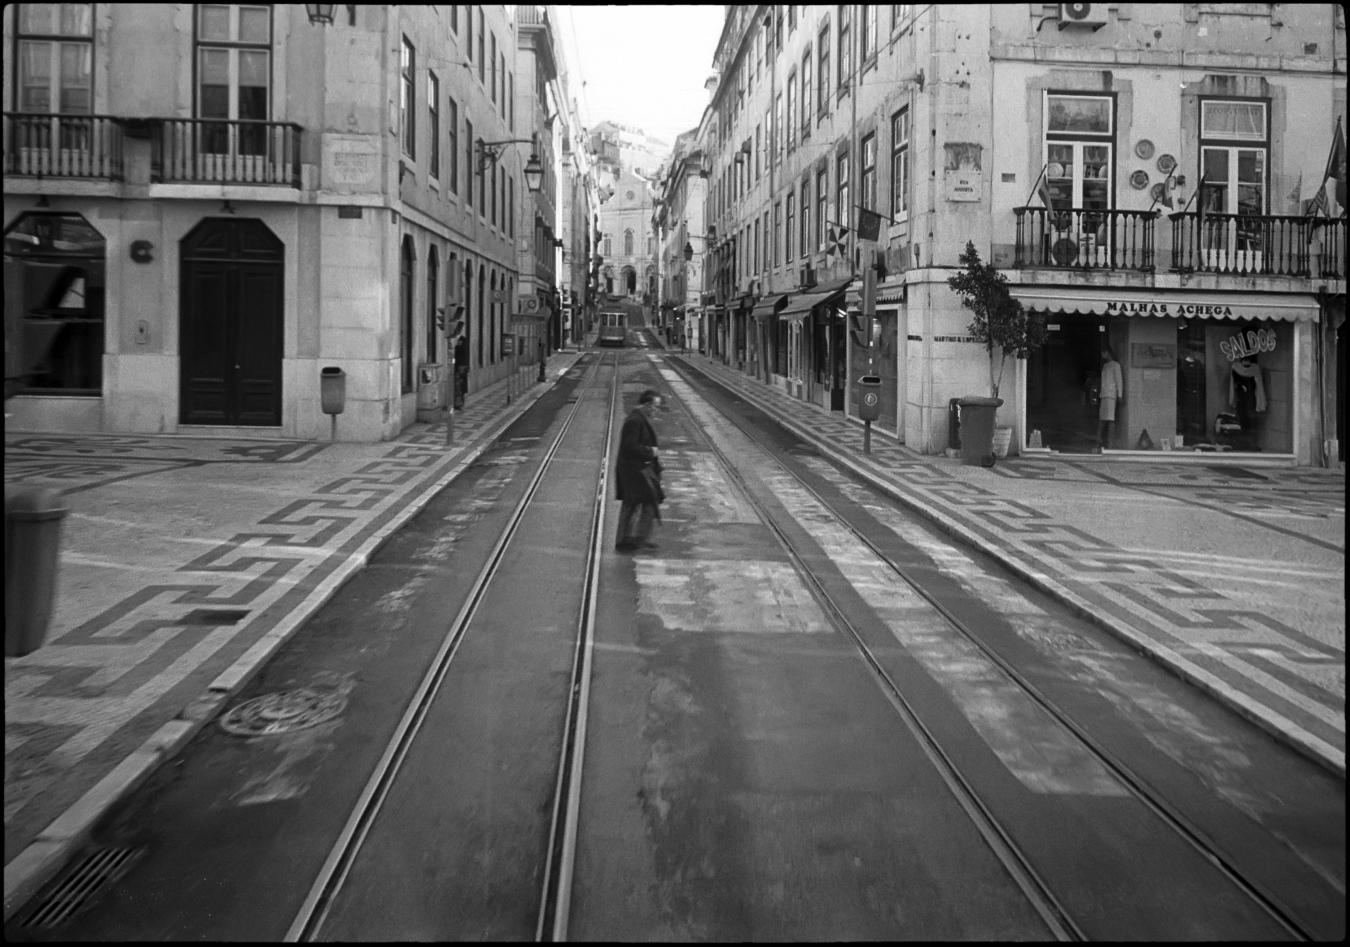 Lisboa 1999 - 2000 - Fotòpsia,  Homaris Foto Arxiu